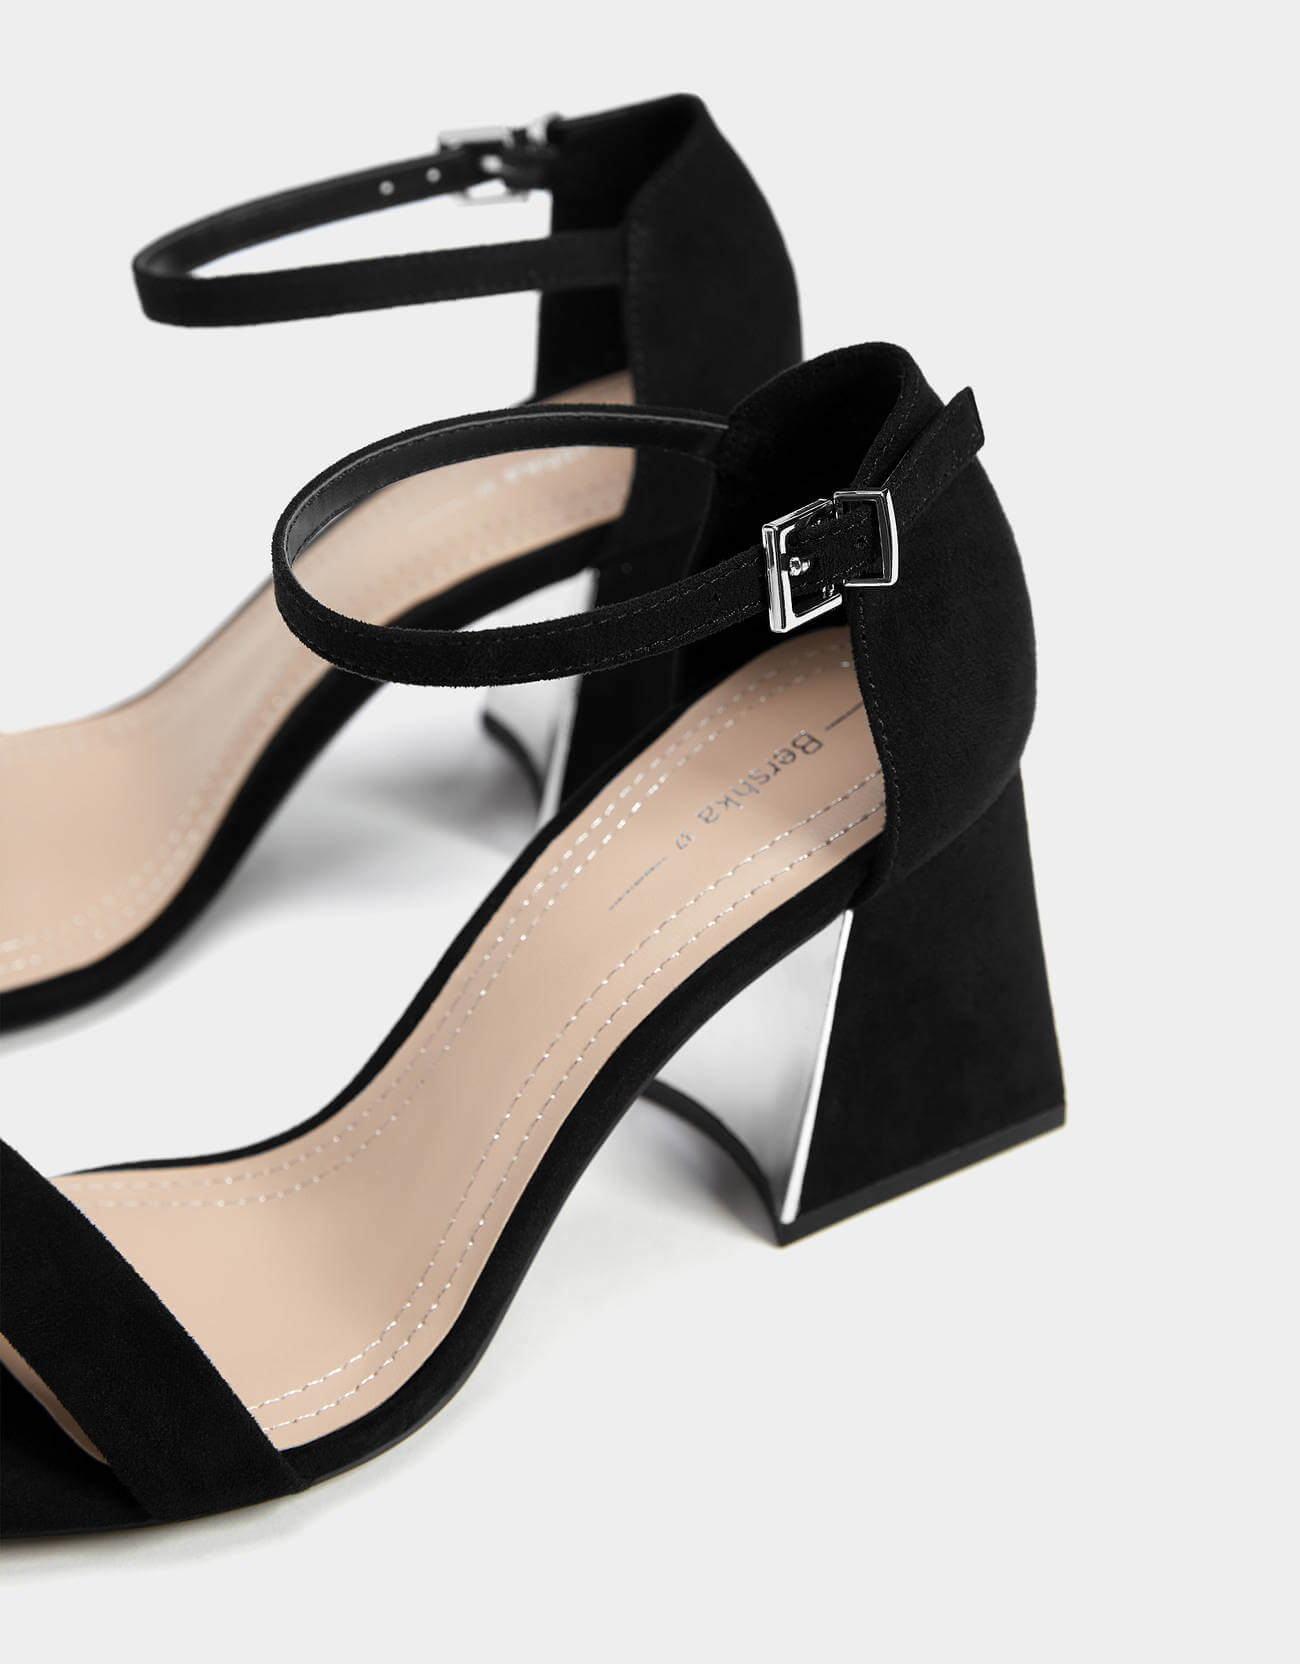 bershka kısa topuklu ayakkabı